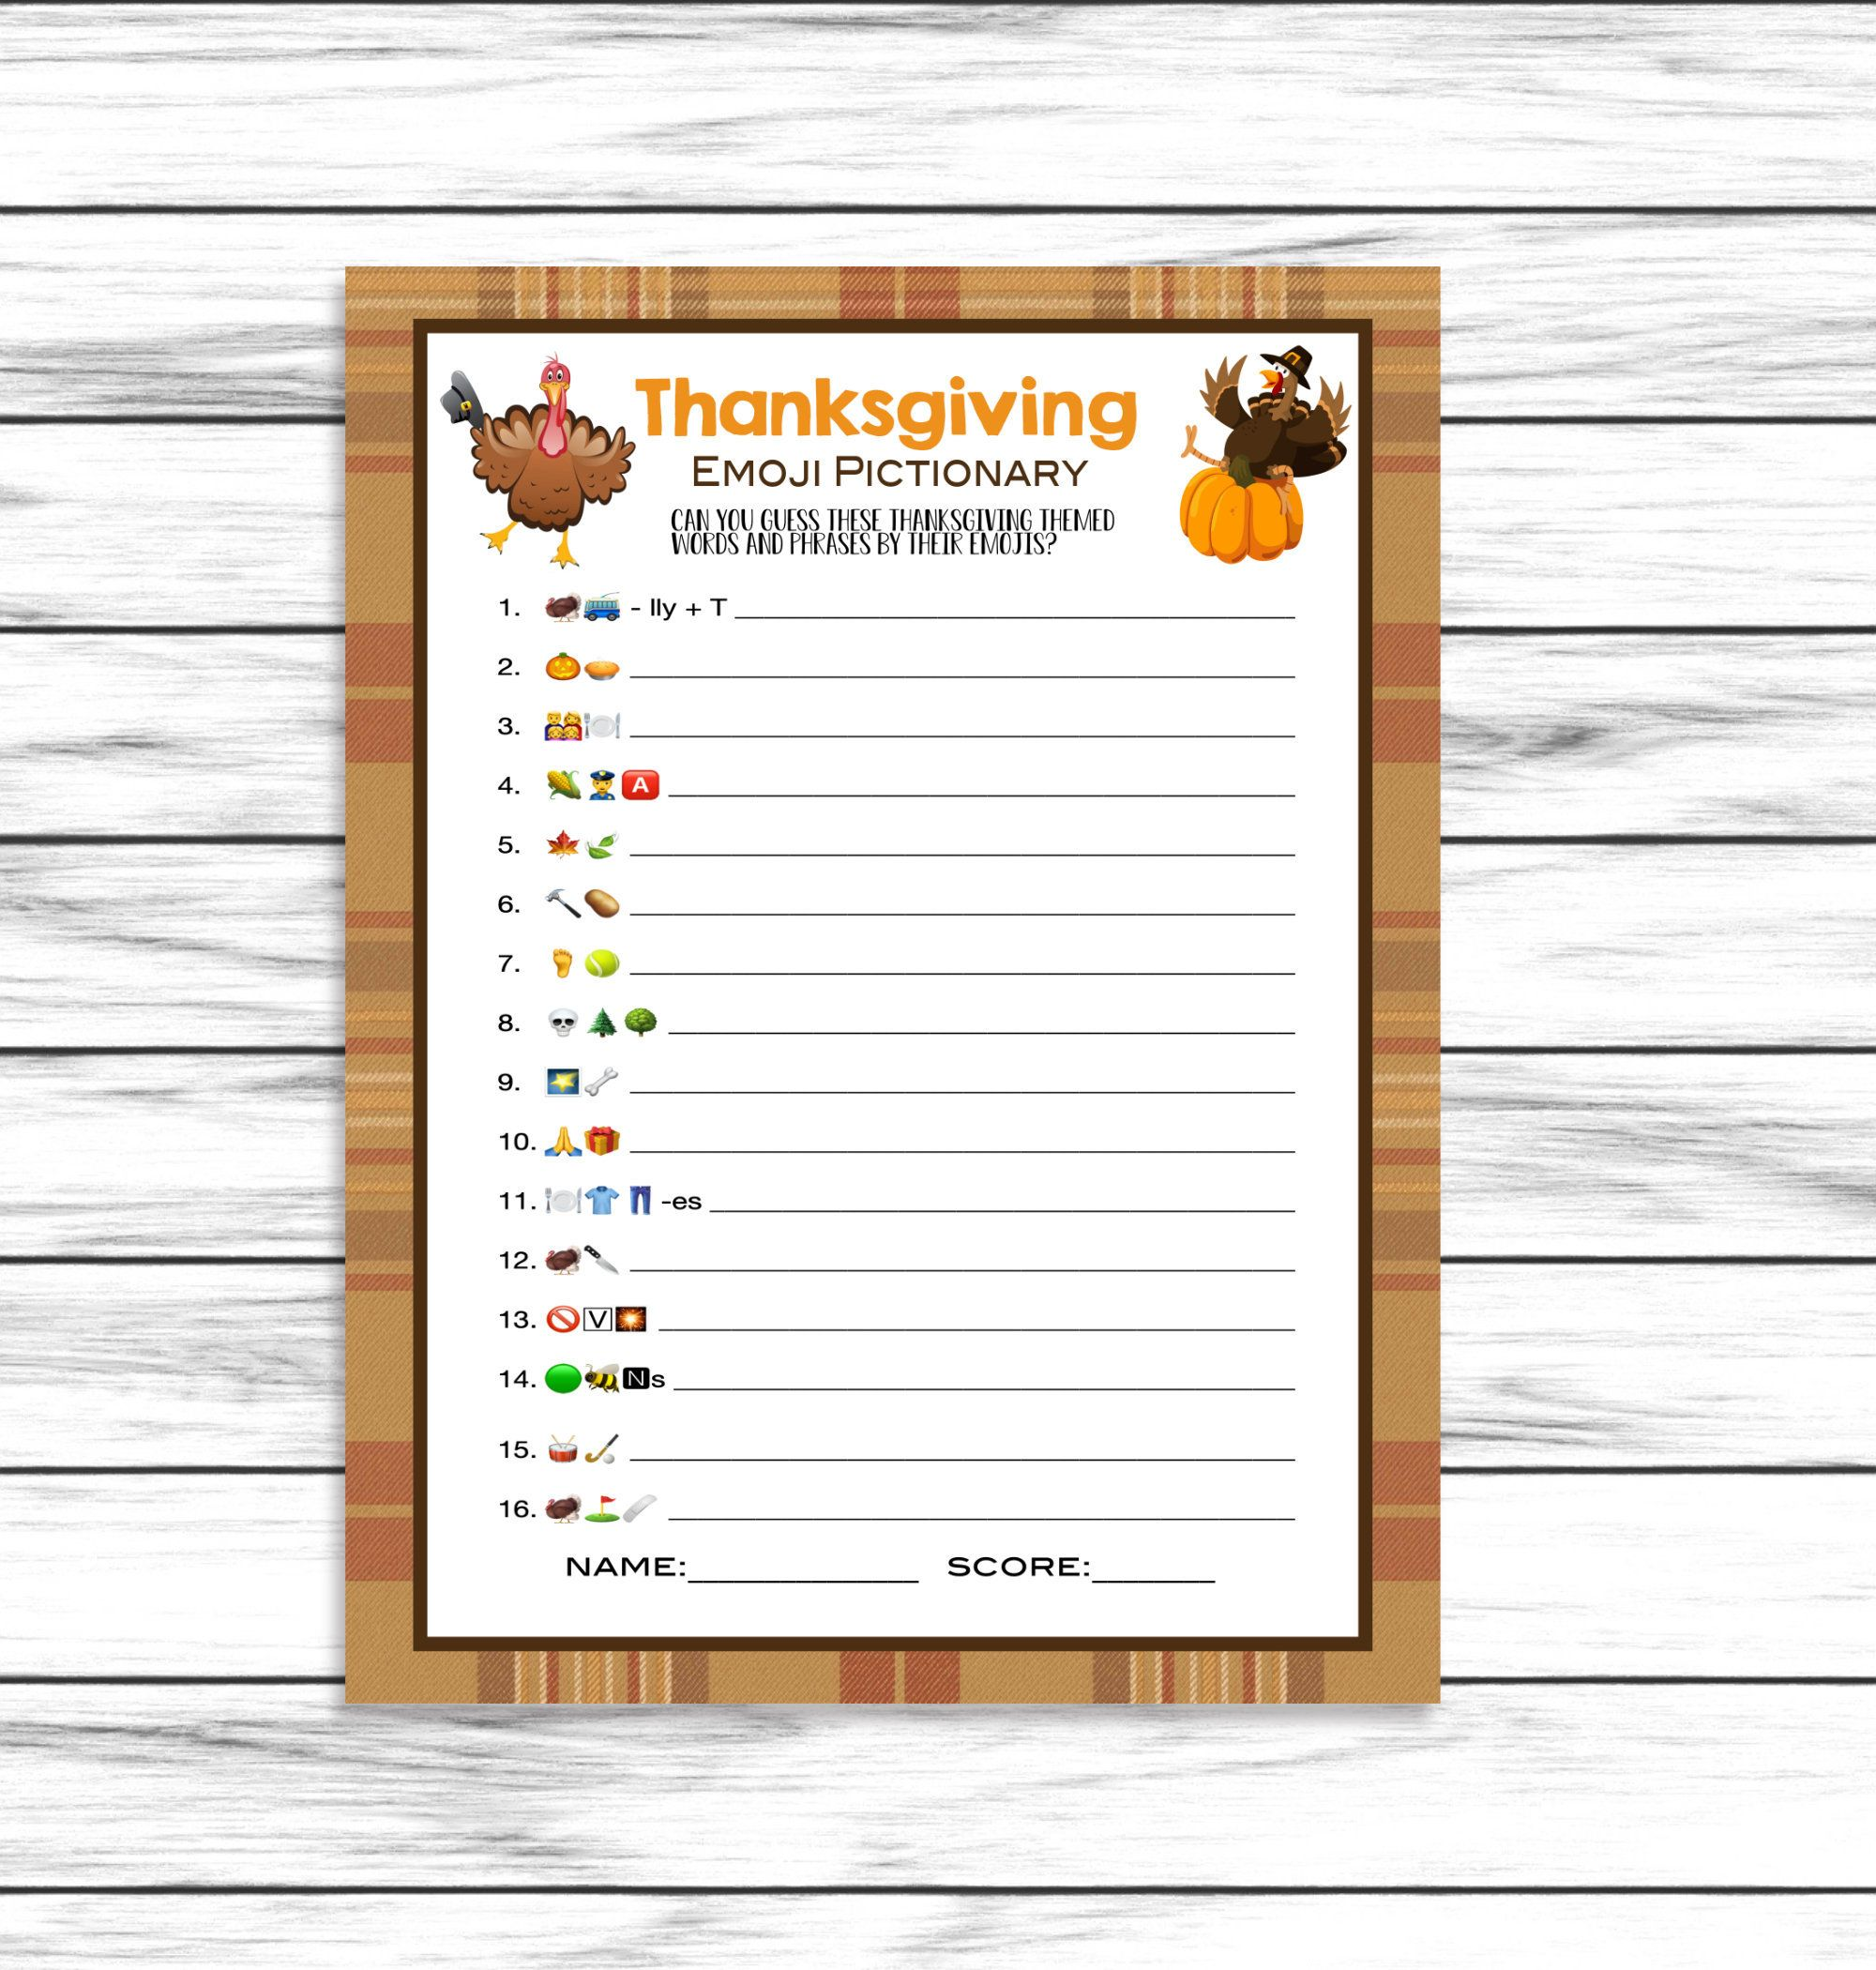 Thanksgiving Emoji Game Emoji Pictionary Party Game Emoji Etsy In 2020 Emoji Games Thanksgiving Family Games Thanksgiving Games